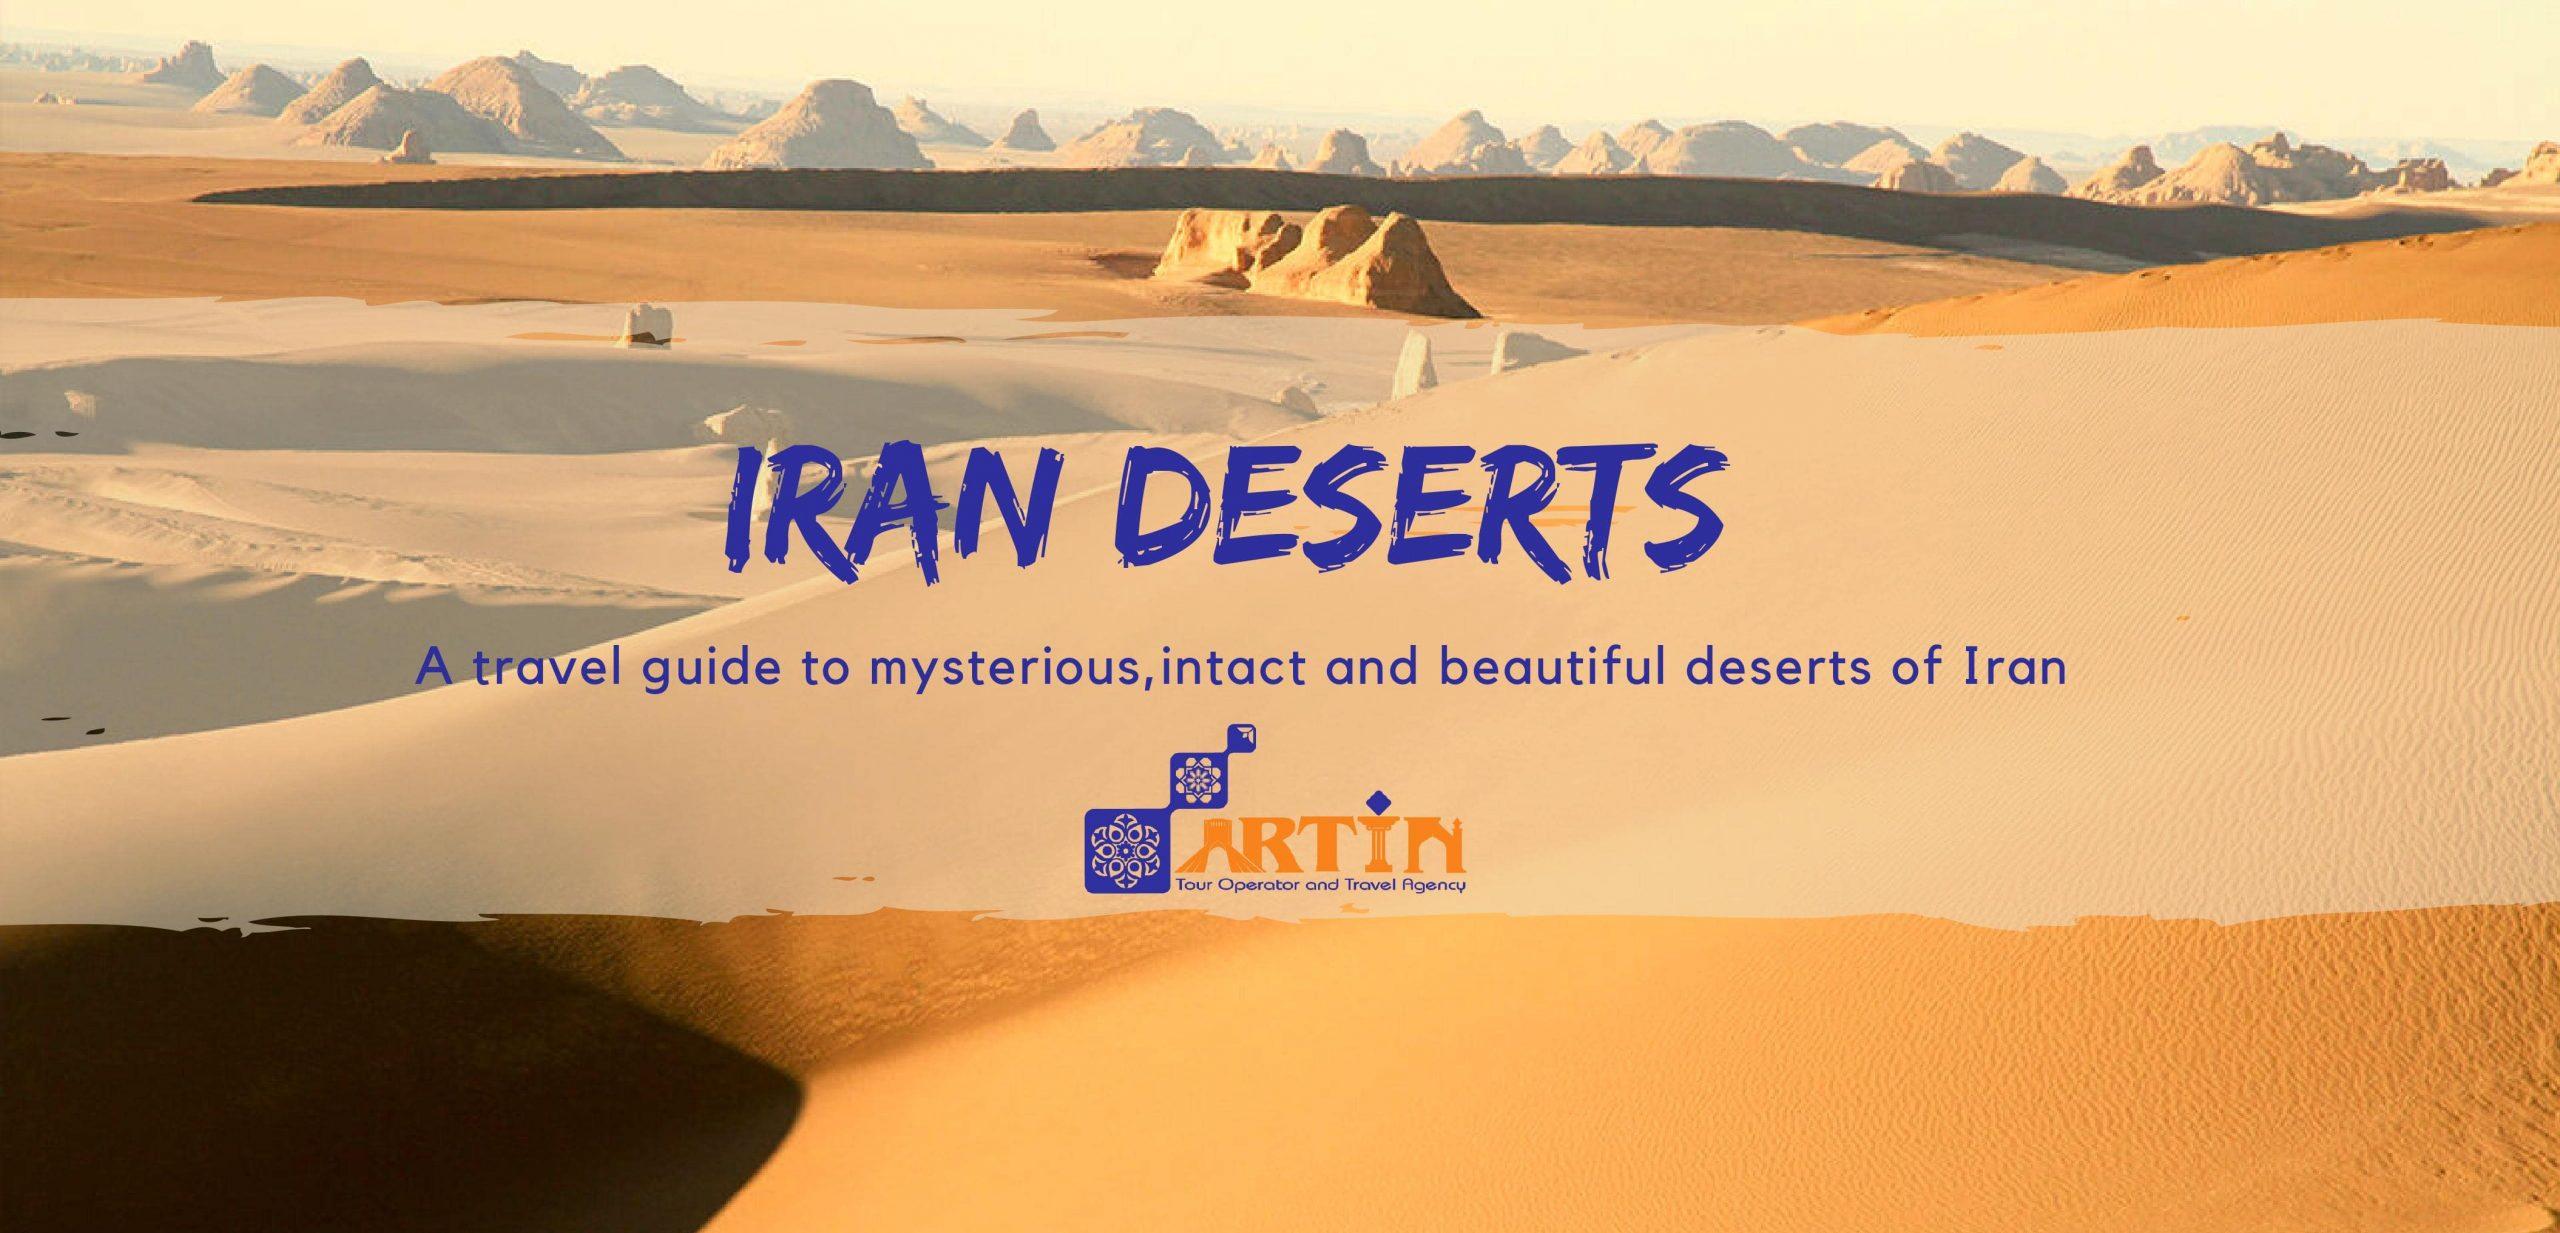 Iran deserts- a travel guige to Iran